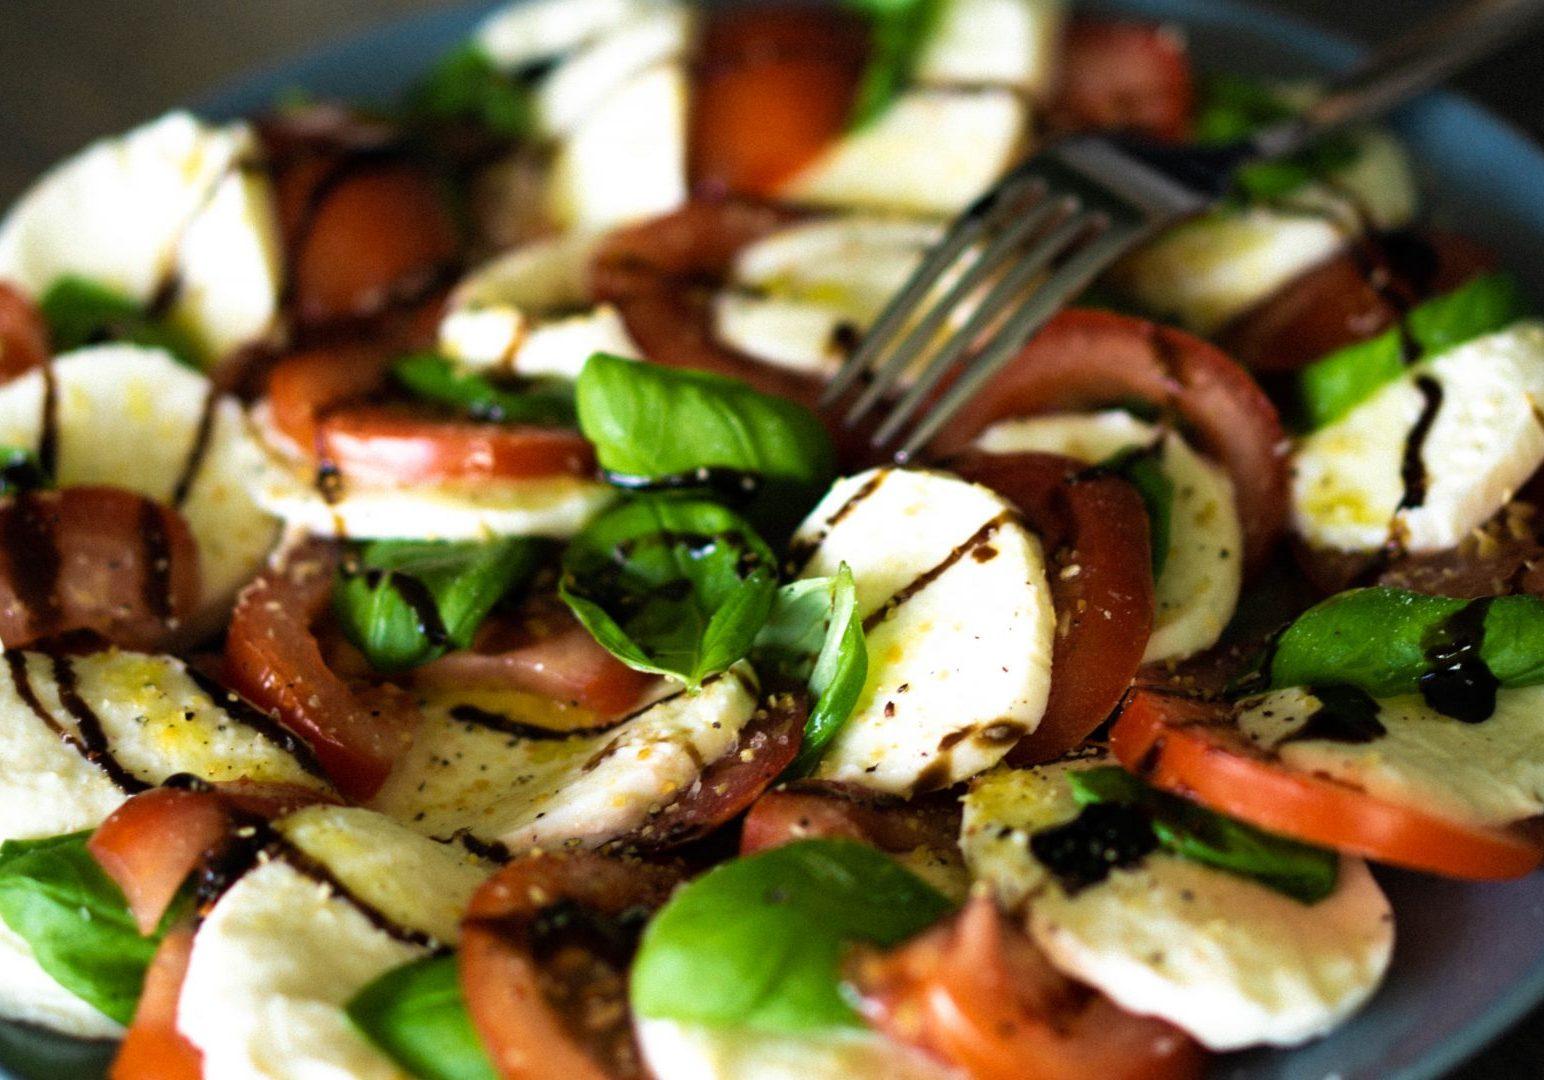 Insalata Caprese with dressing. Tomato, Basil and mozzarella lying on a blue plate